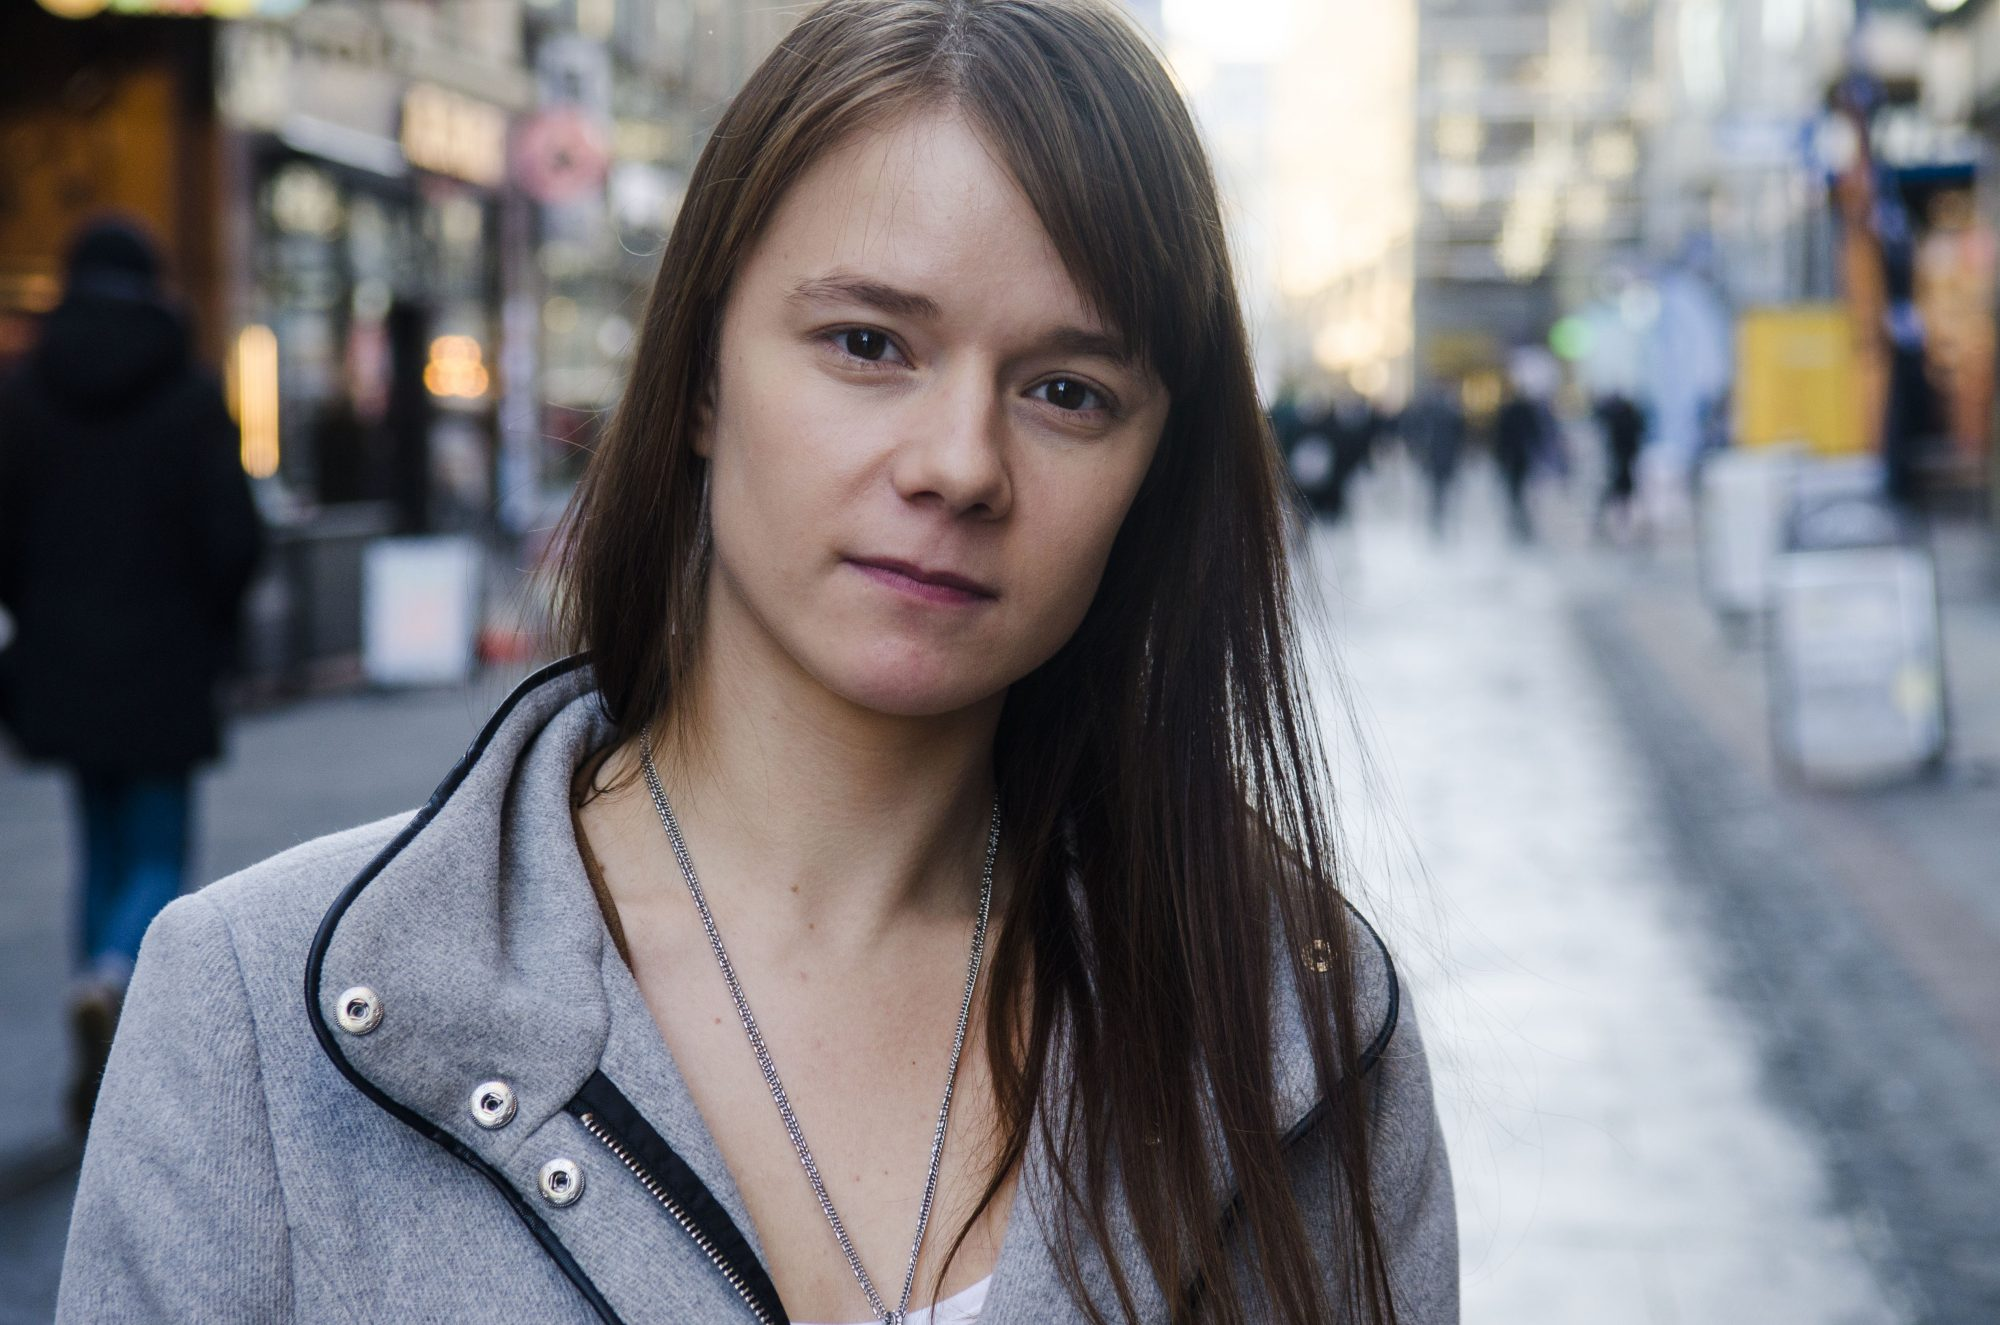 Ingrid Bruun